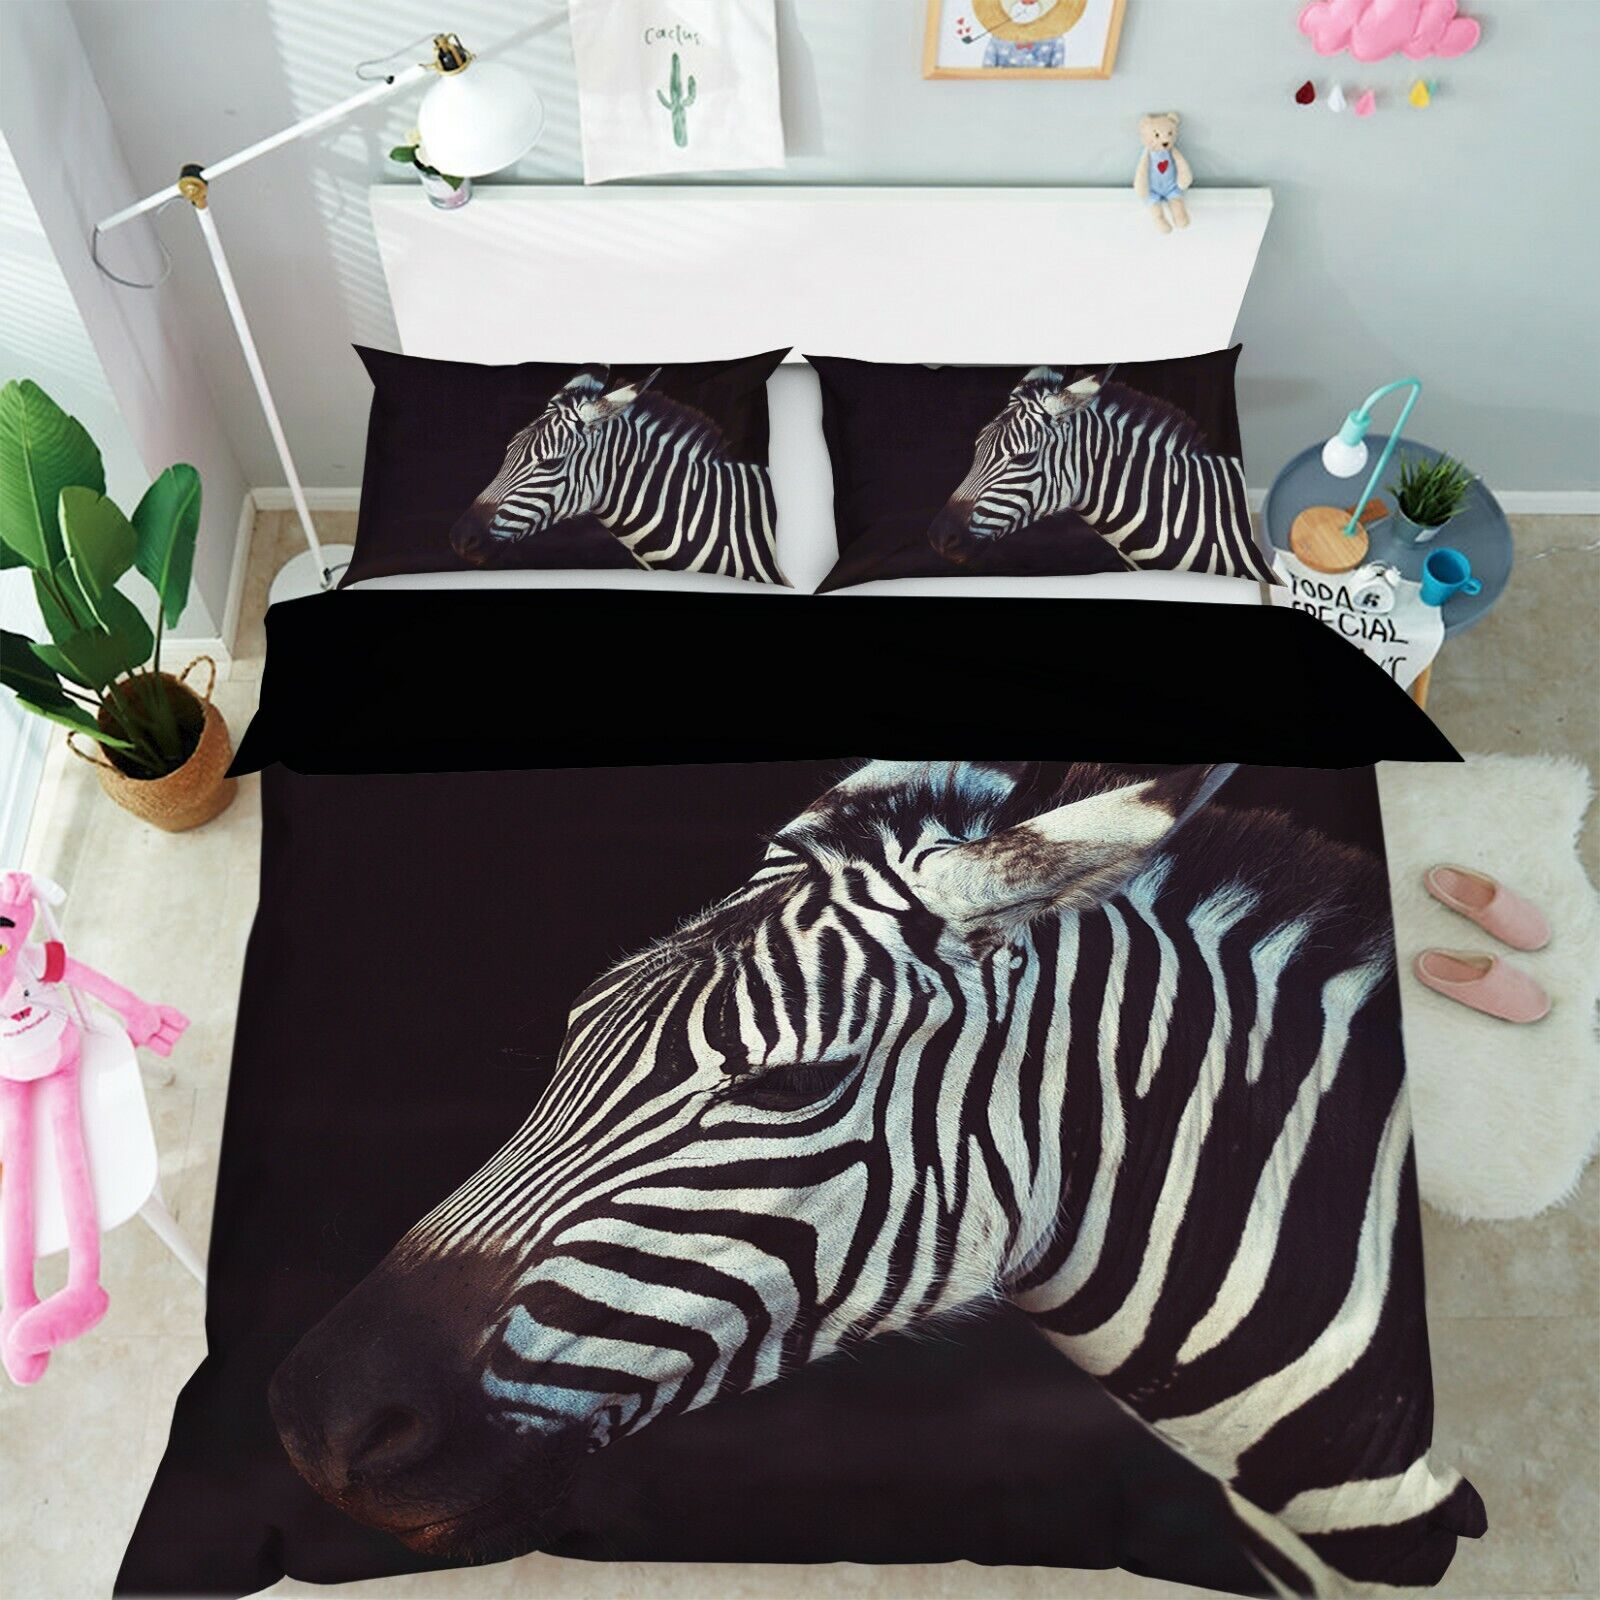 3D Cute Zebra P20 Animal Bed Pillowcases Quilt Duvet Cover Set Queen King Zoe